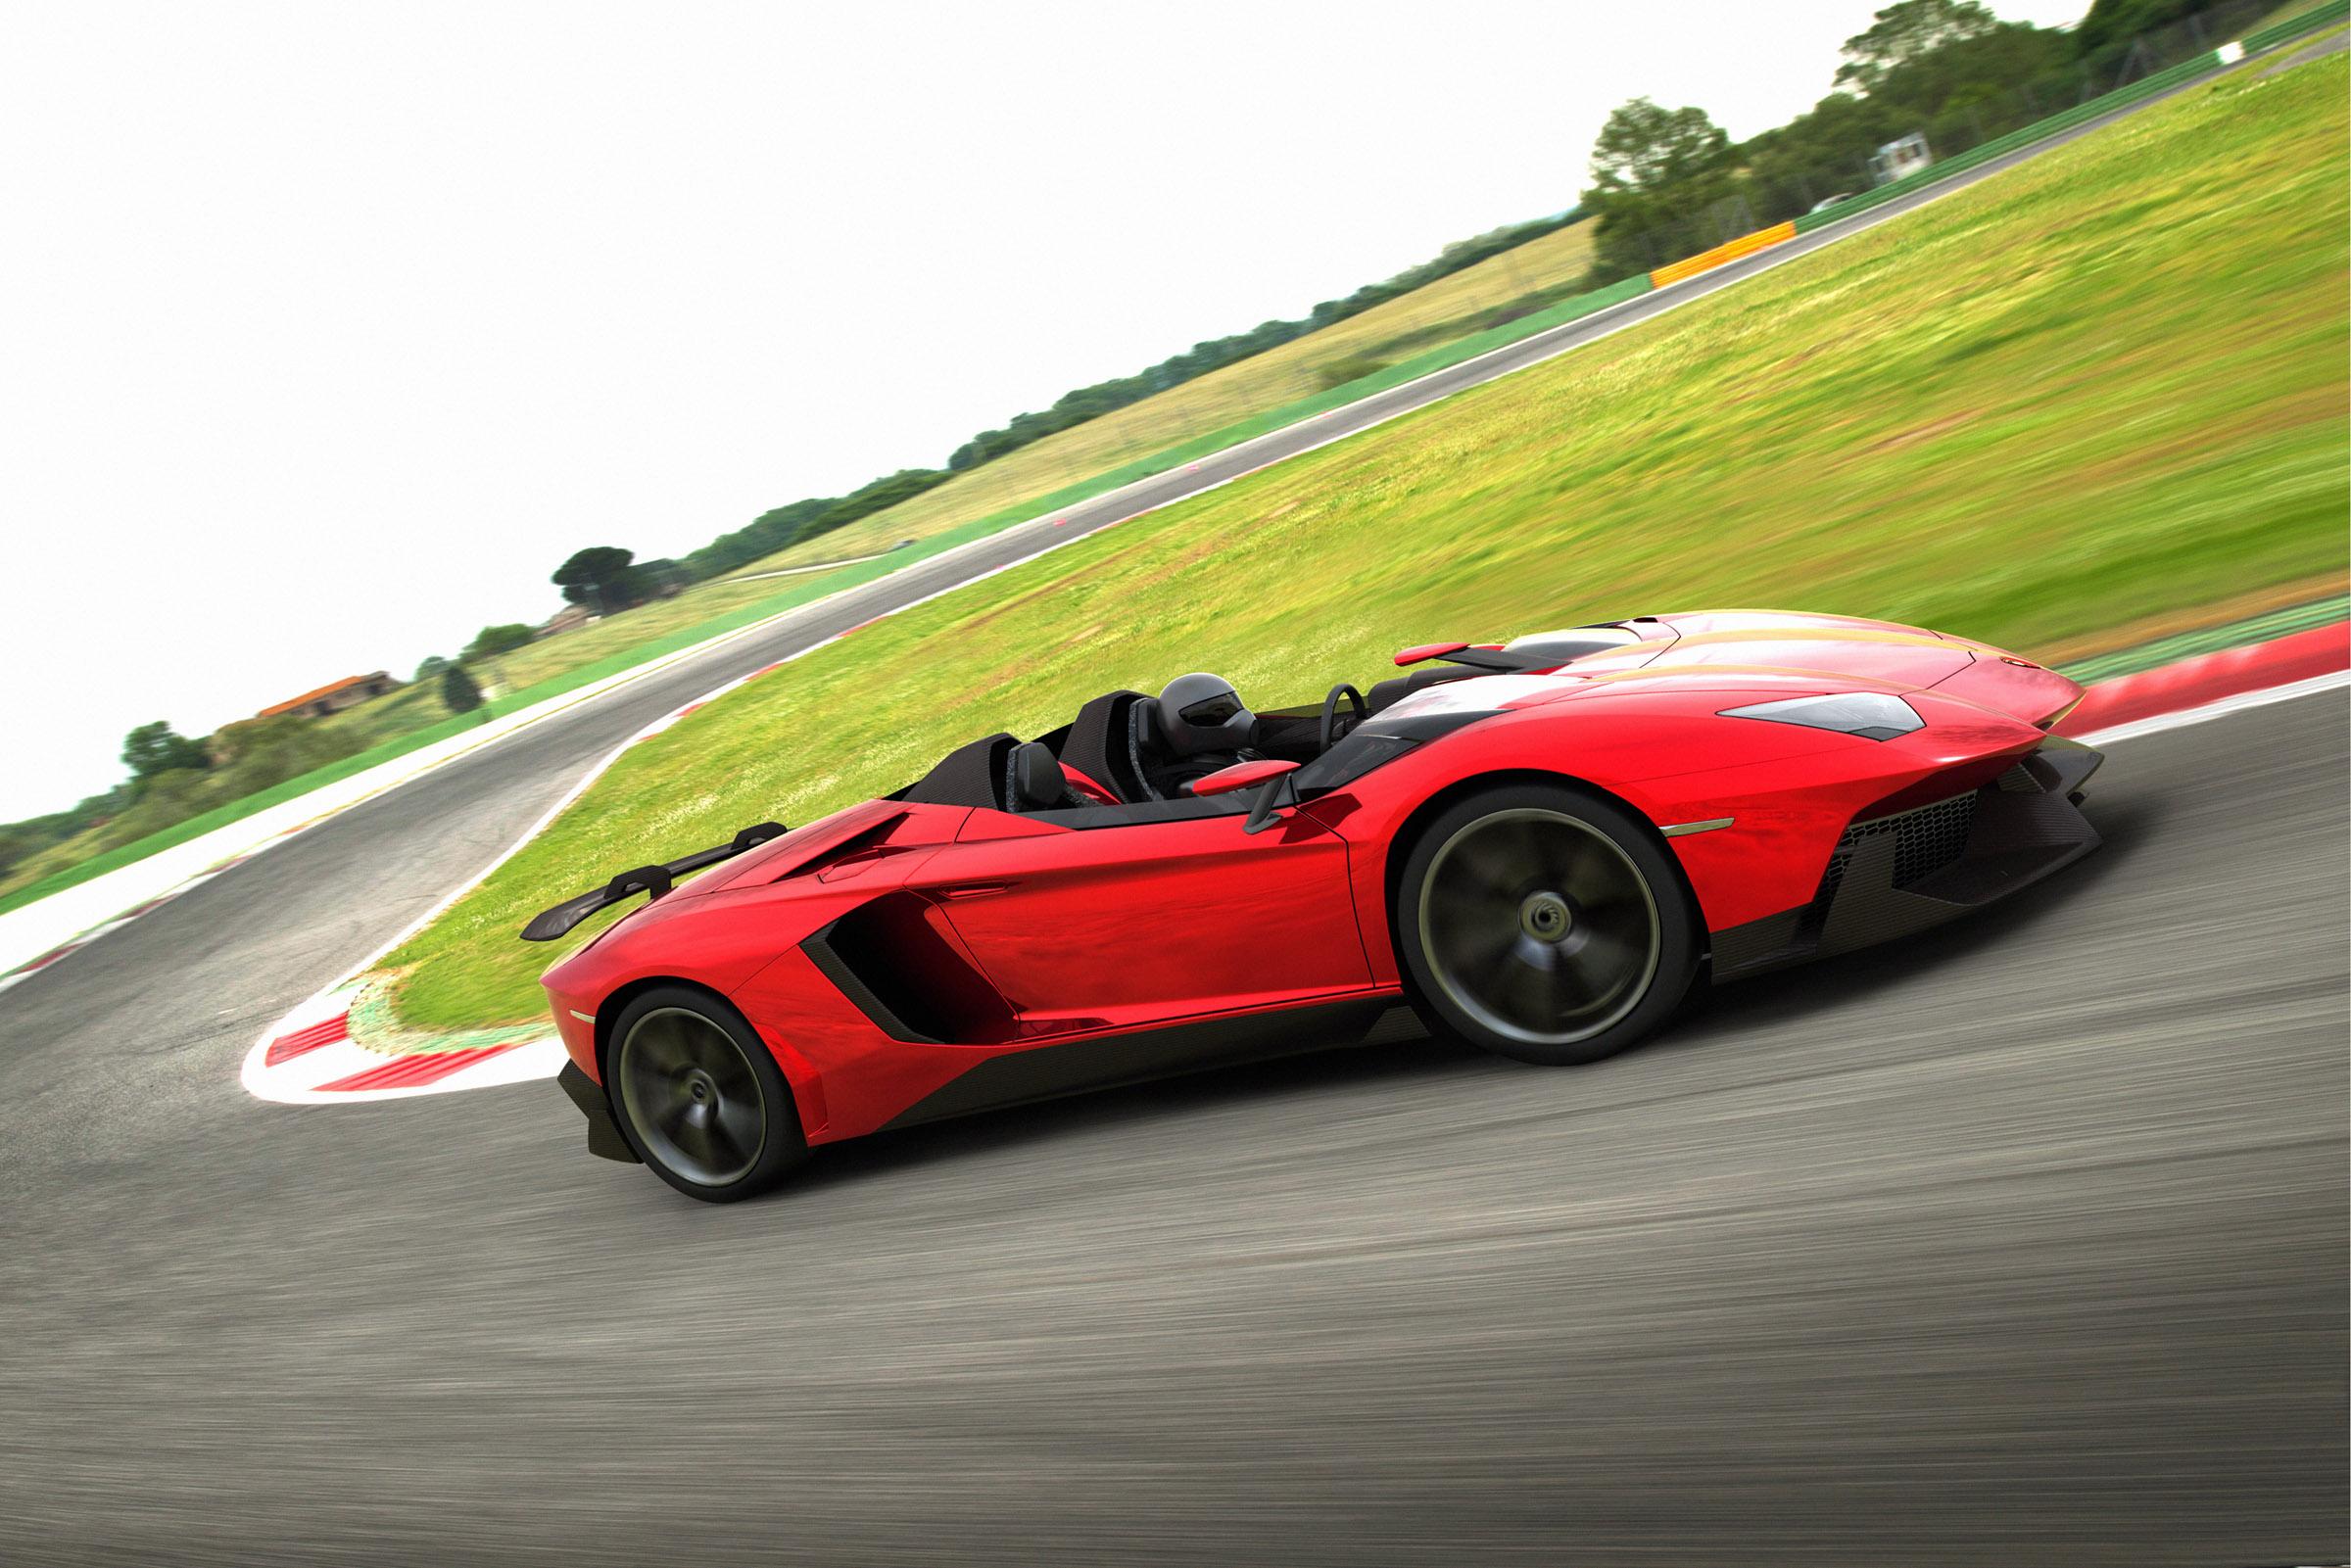 Lamborghini Aventador J Выявлено - фотография №2